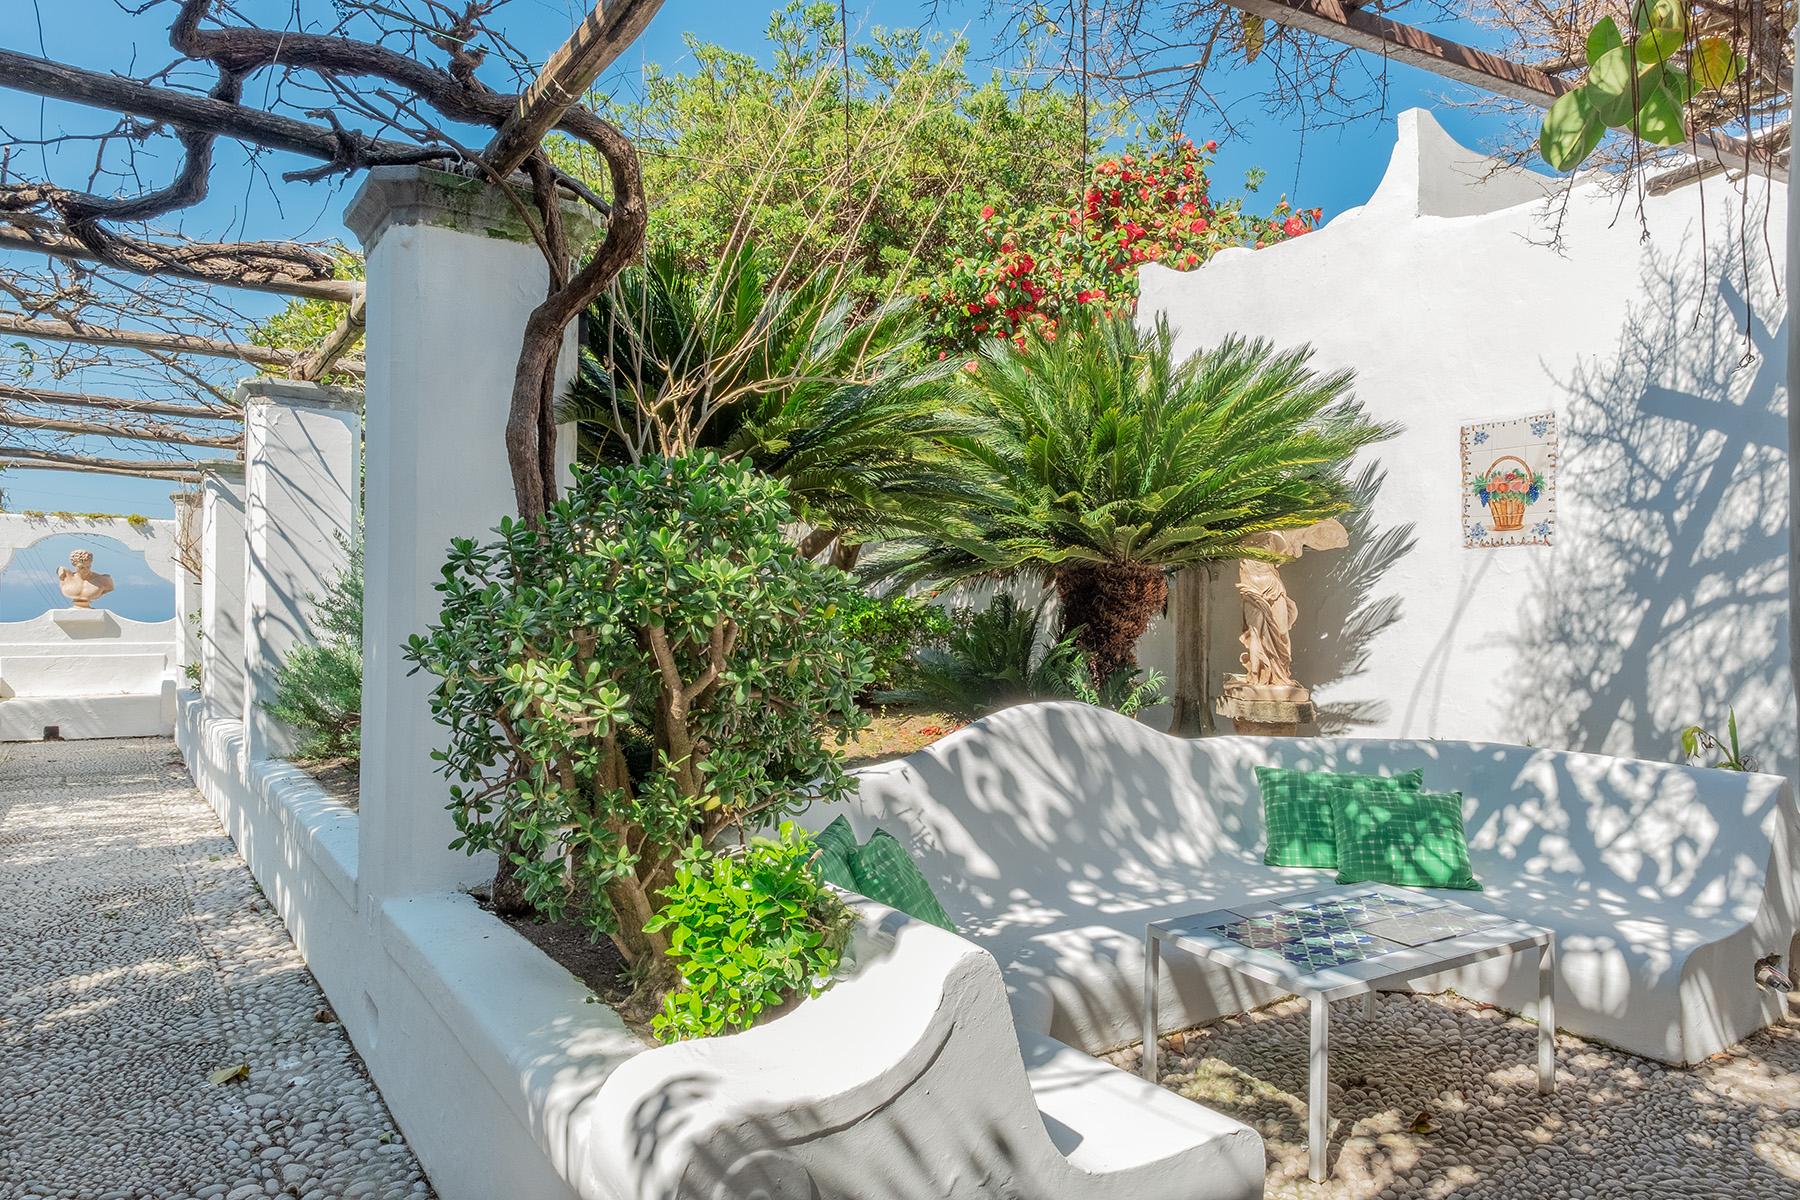 Casa indipendente in Vendita a Capri: 5 locali, 300 mq - Foto 7